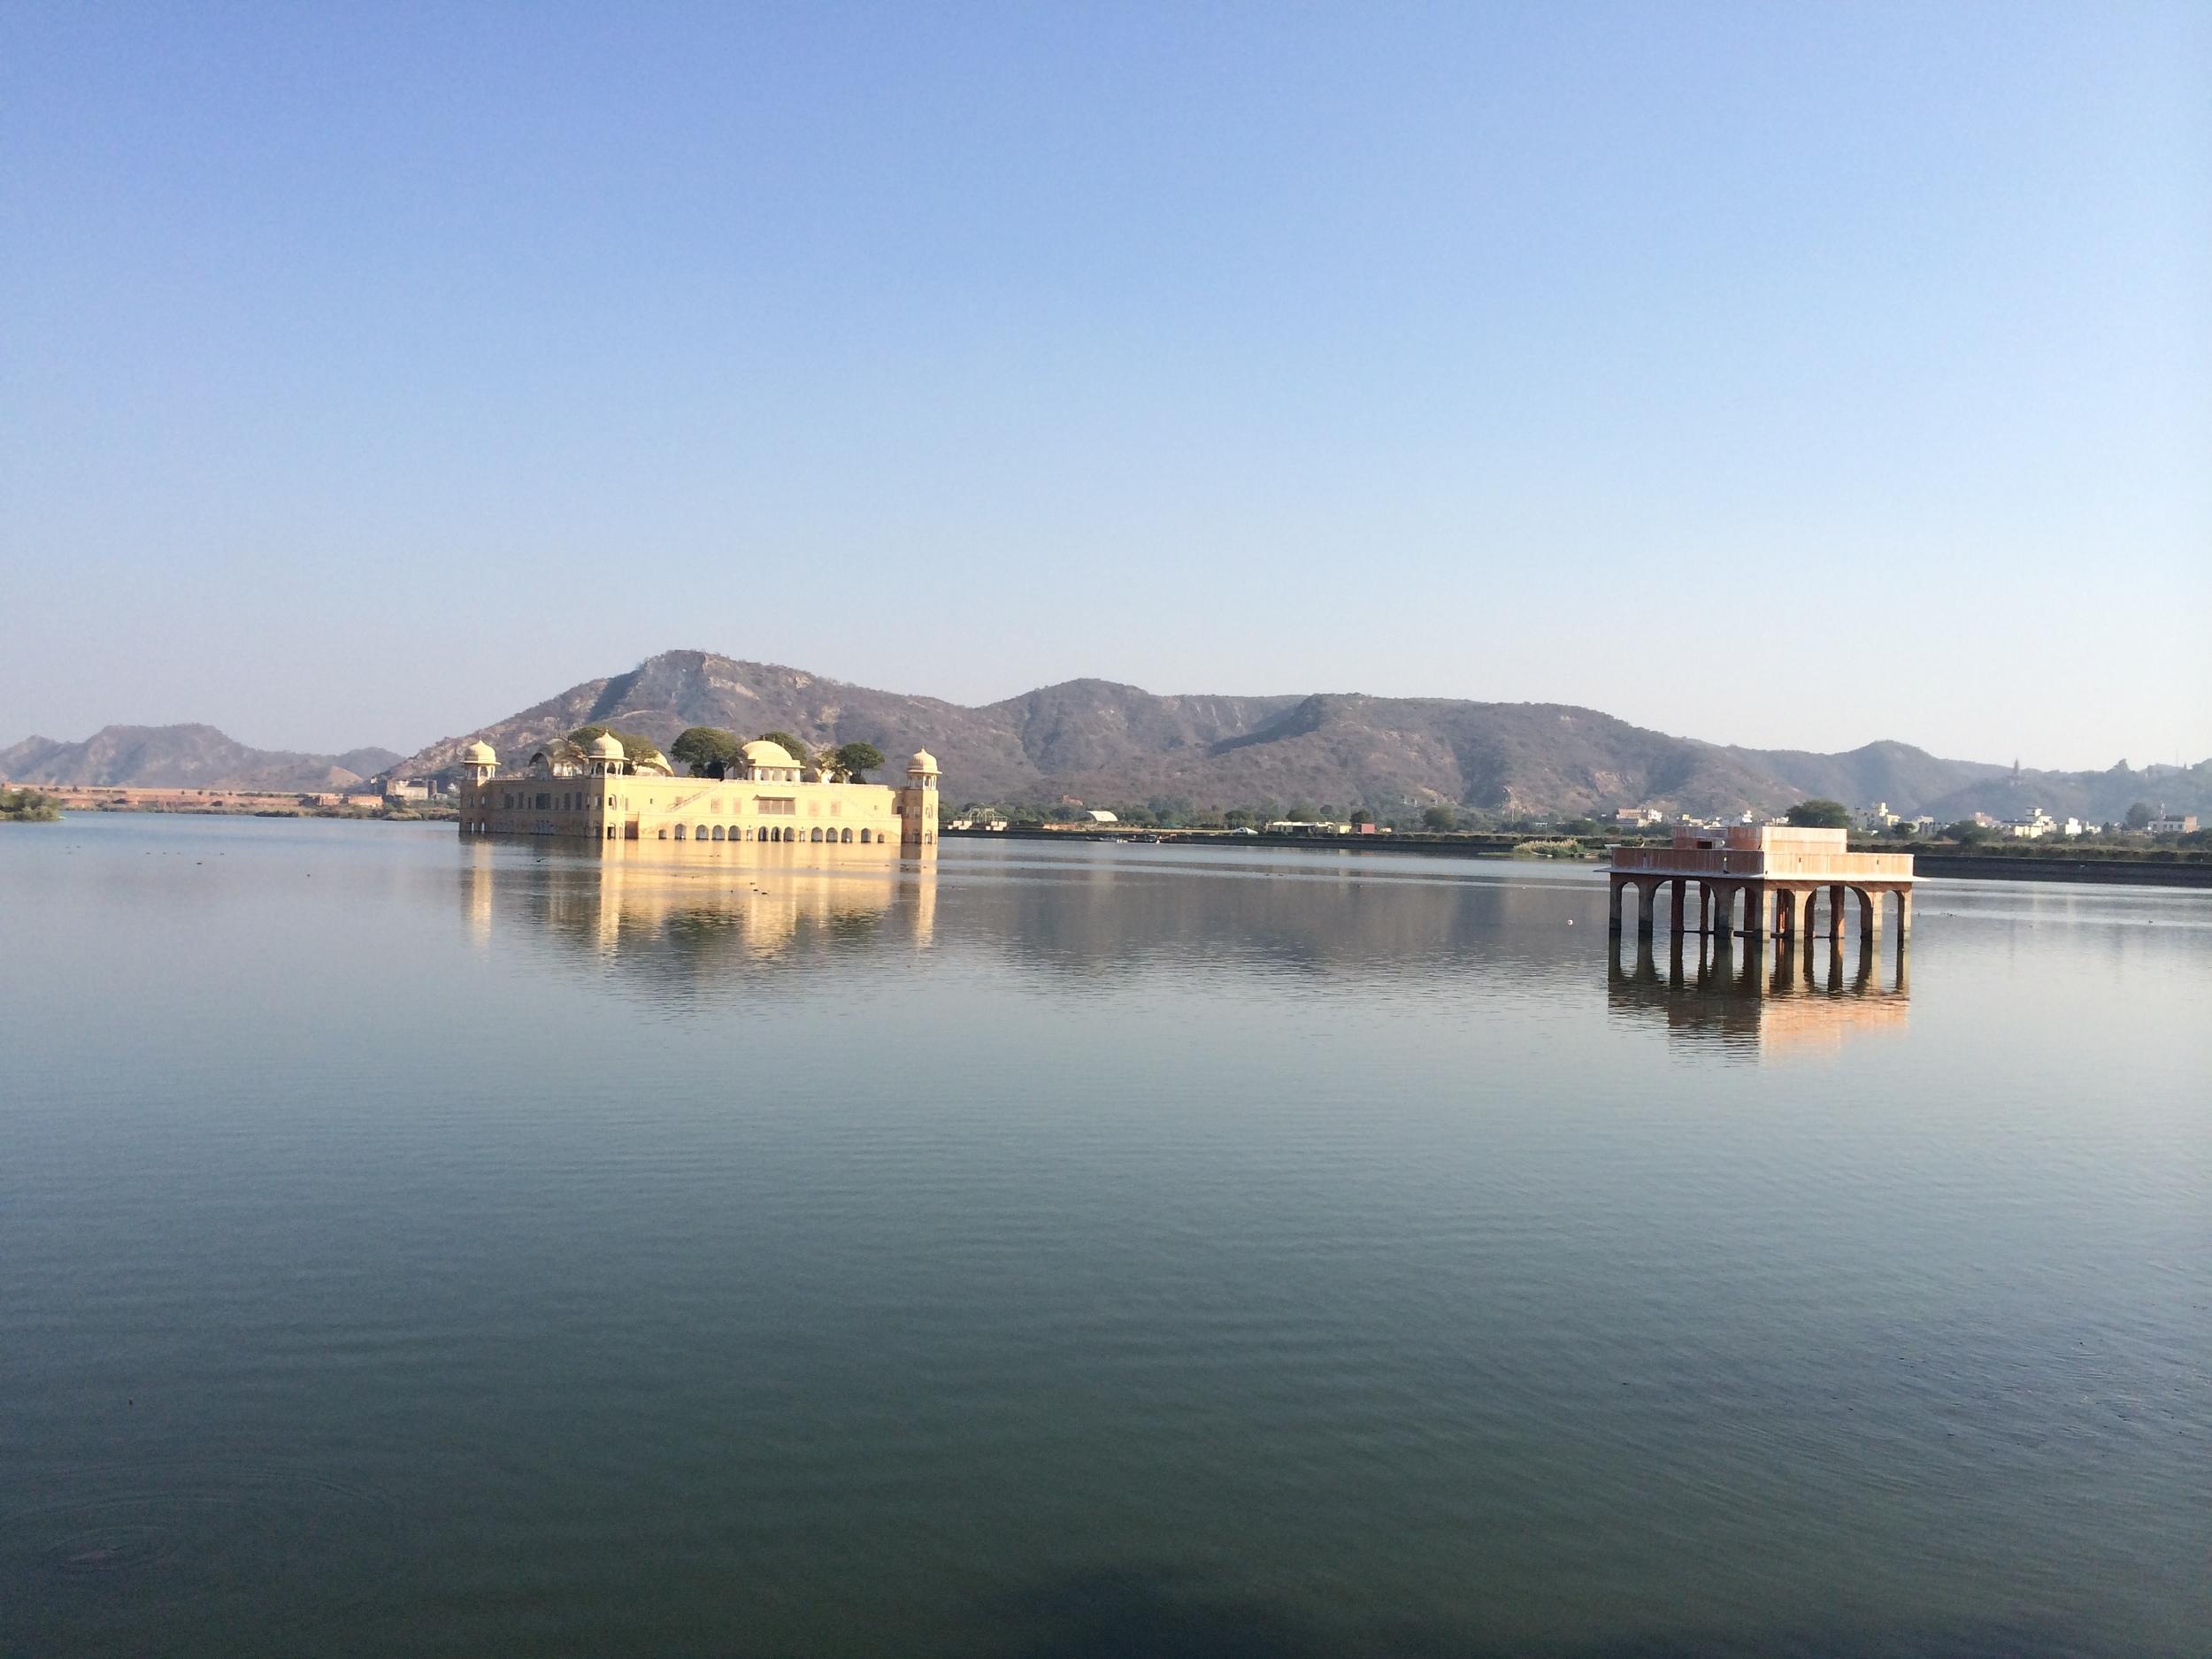 Jal Mahal, the palace on the lake, Jaipur